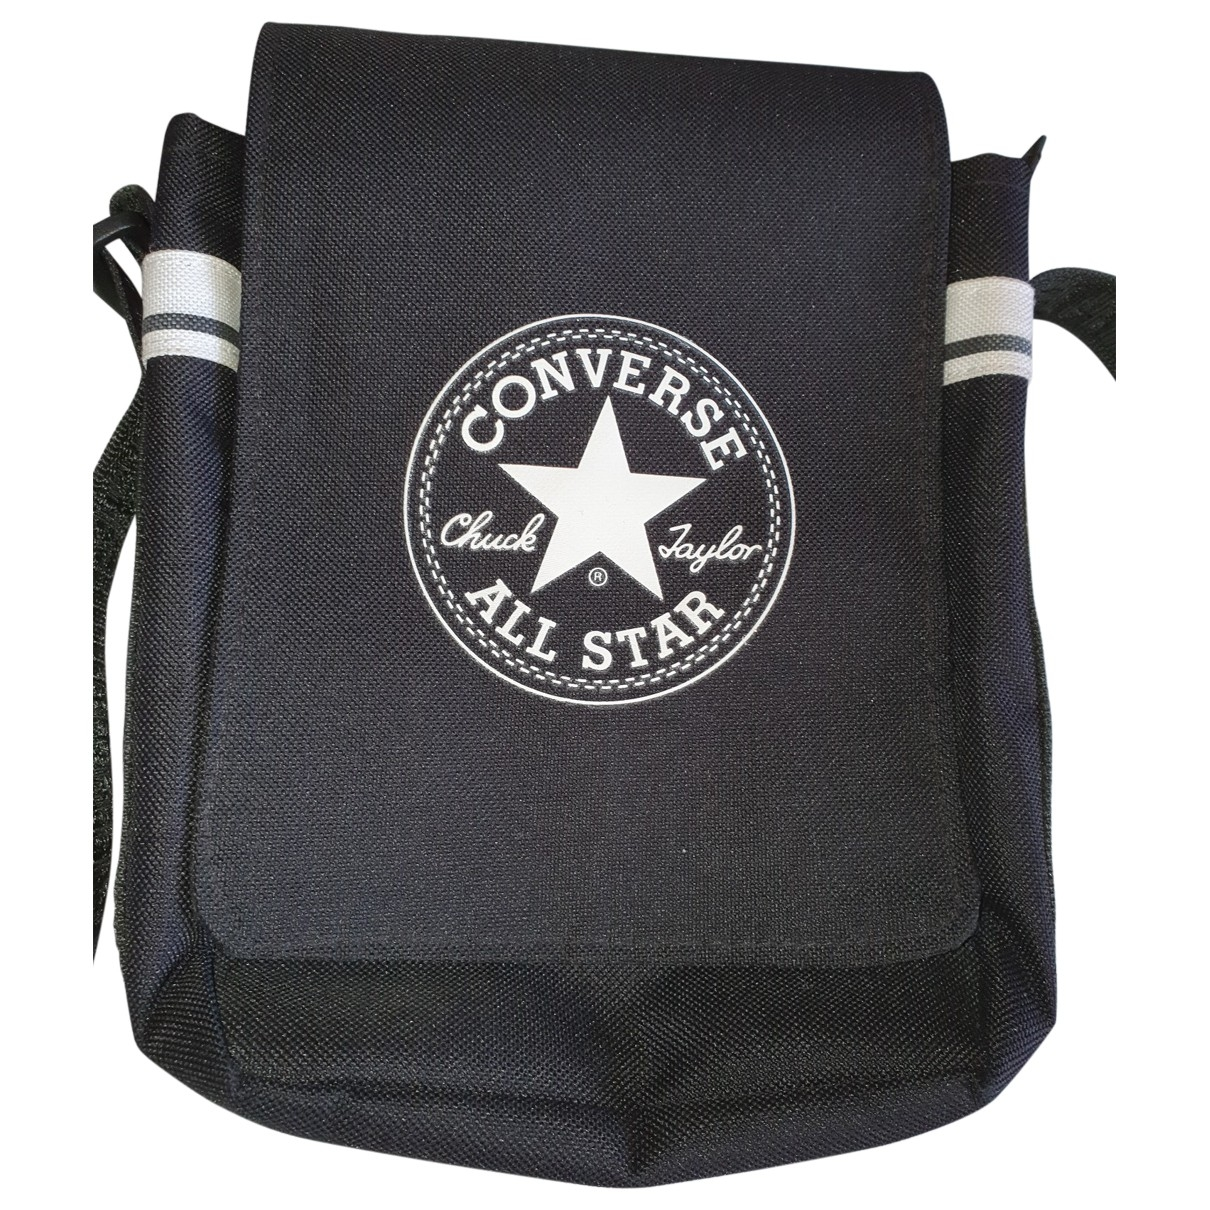 Converse \N Black Cloth handbag for Women \N